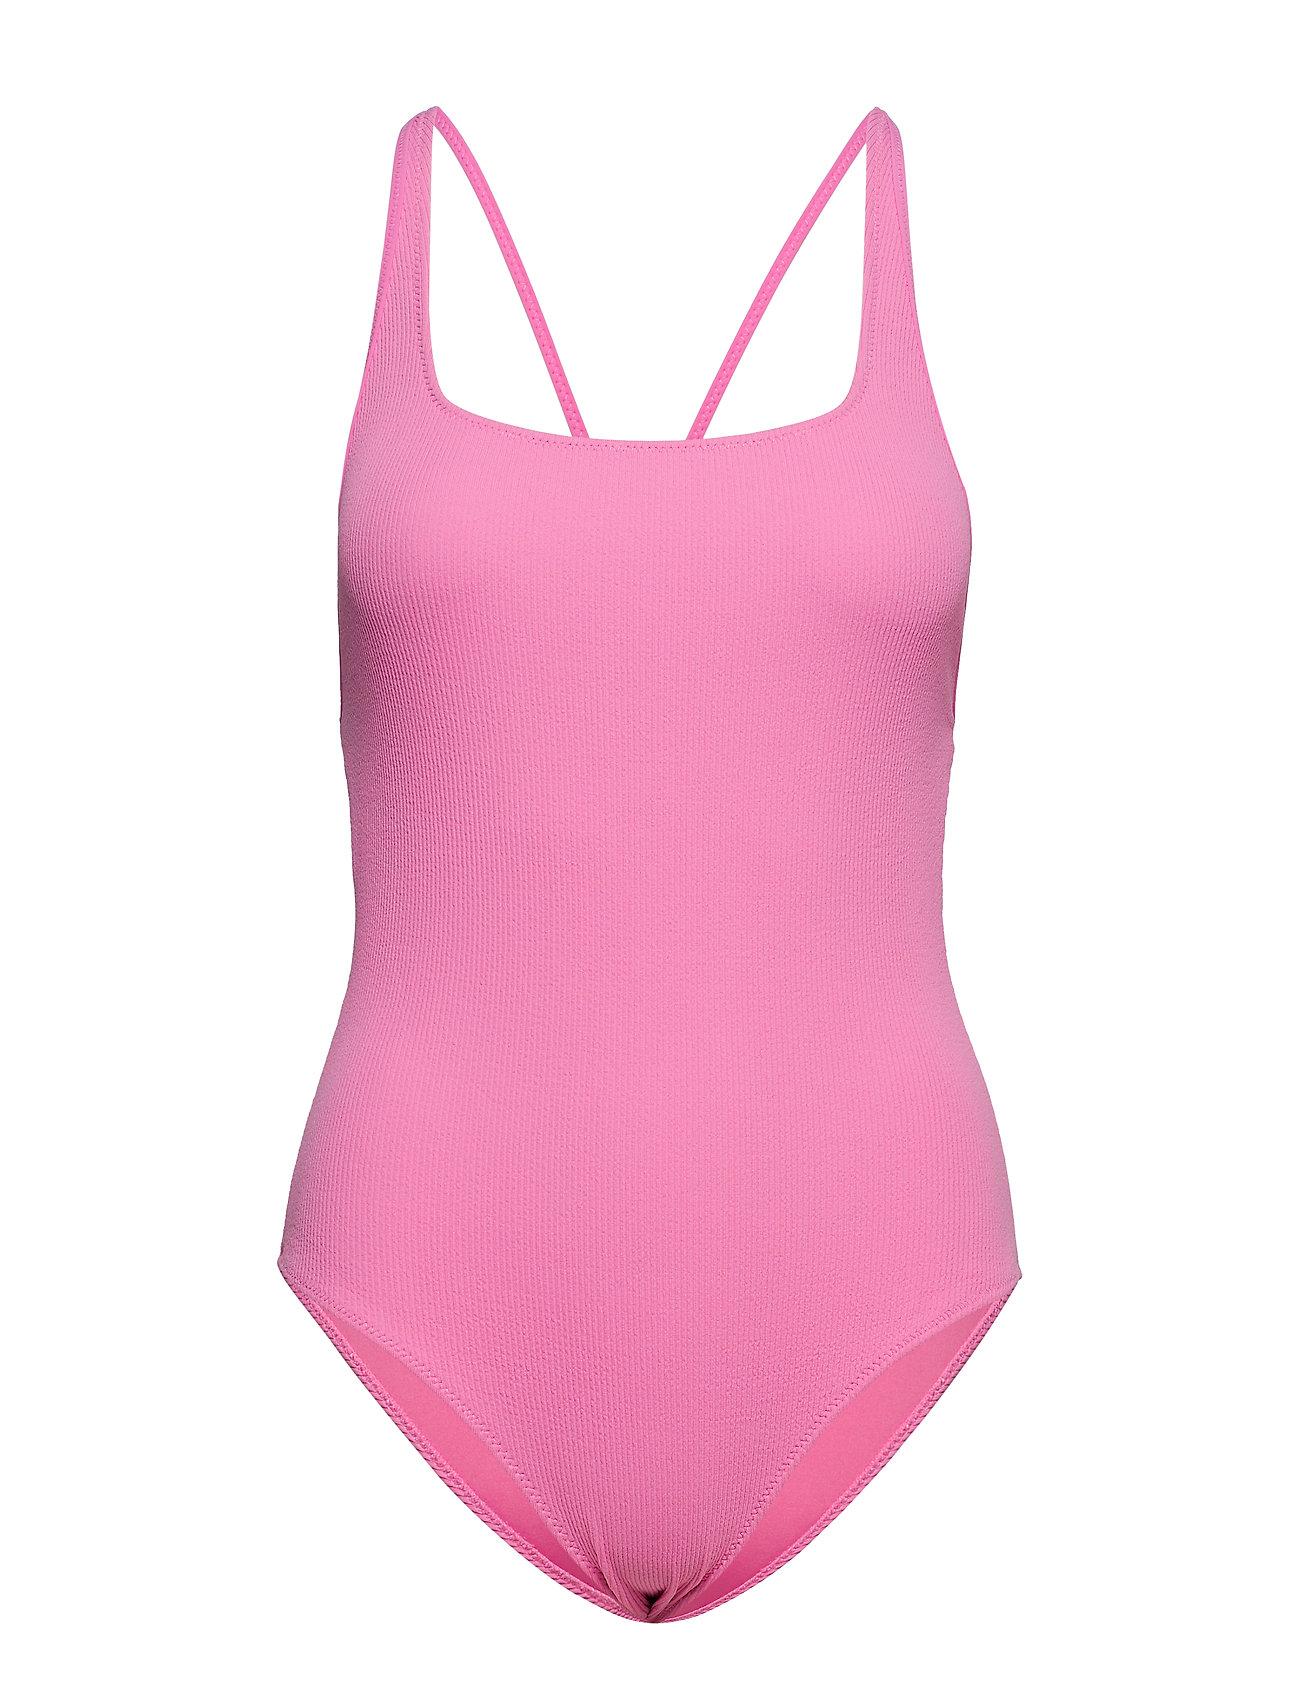 Ganni Textured Swimwear - MOONLIGHT MAUVE